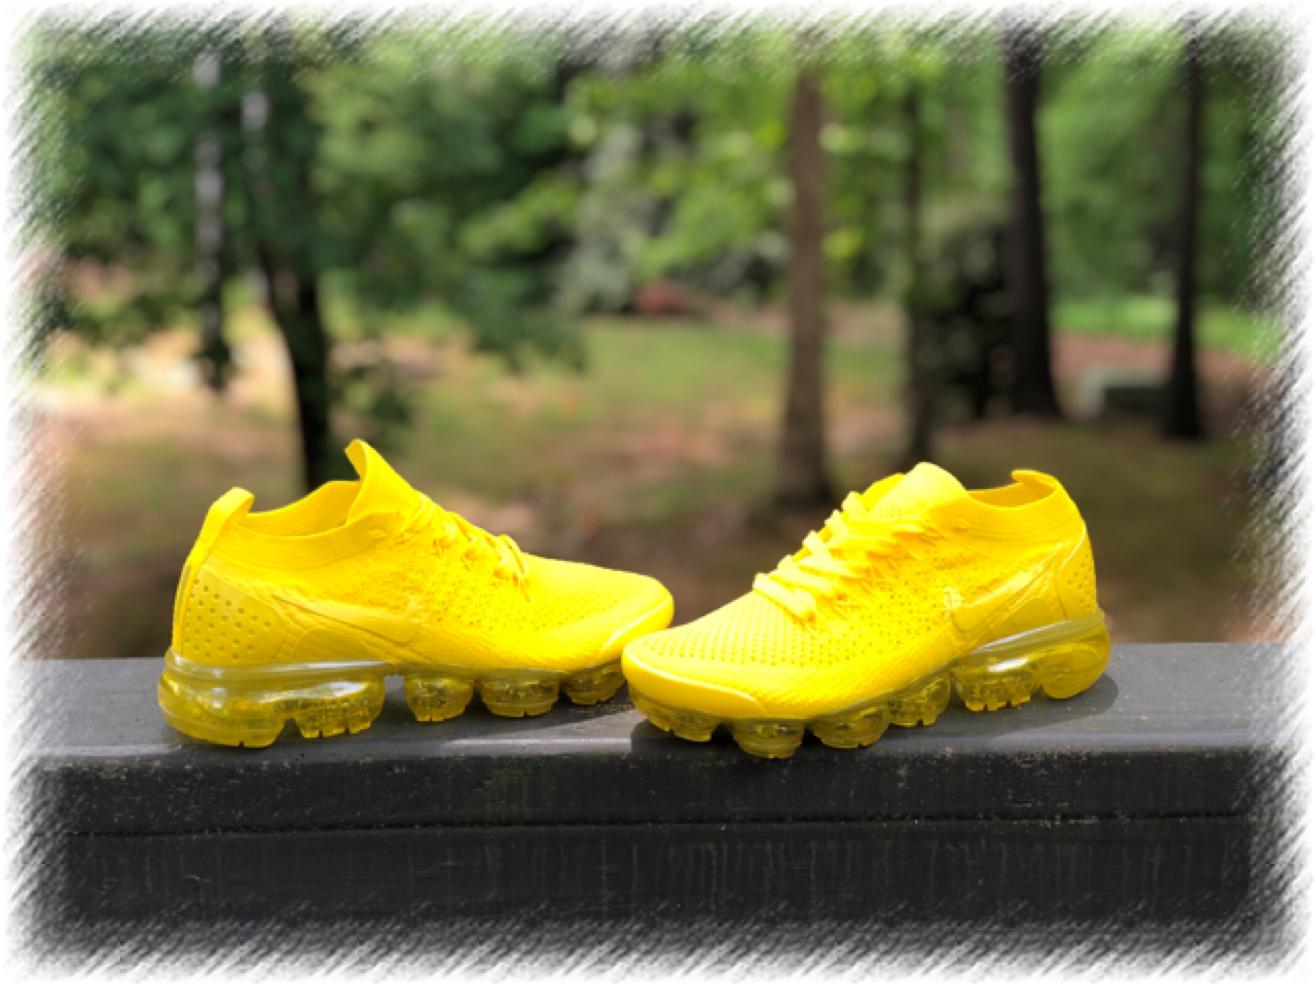 Custom Sunshine Yellow Nike Vapormax